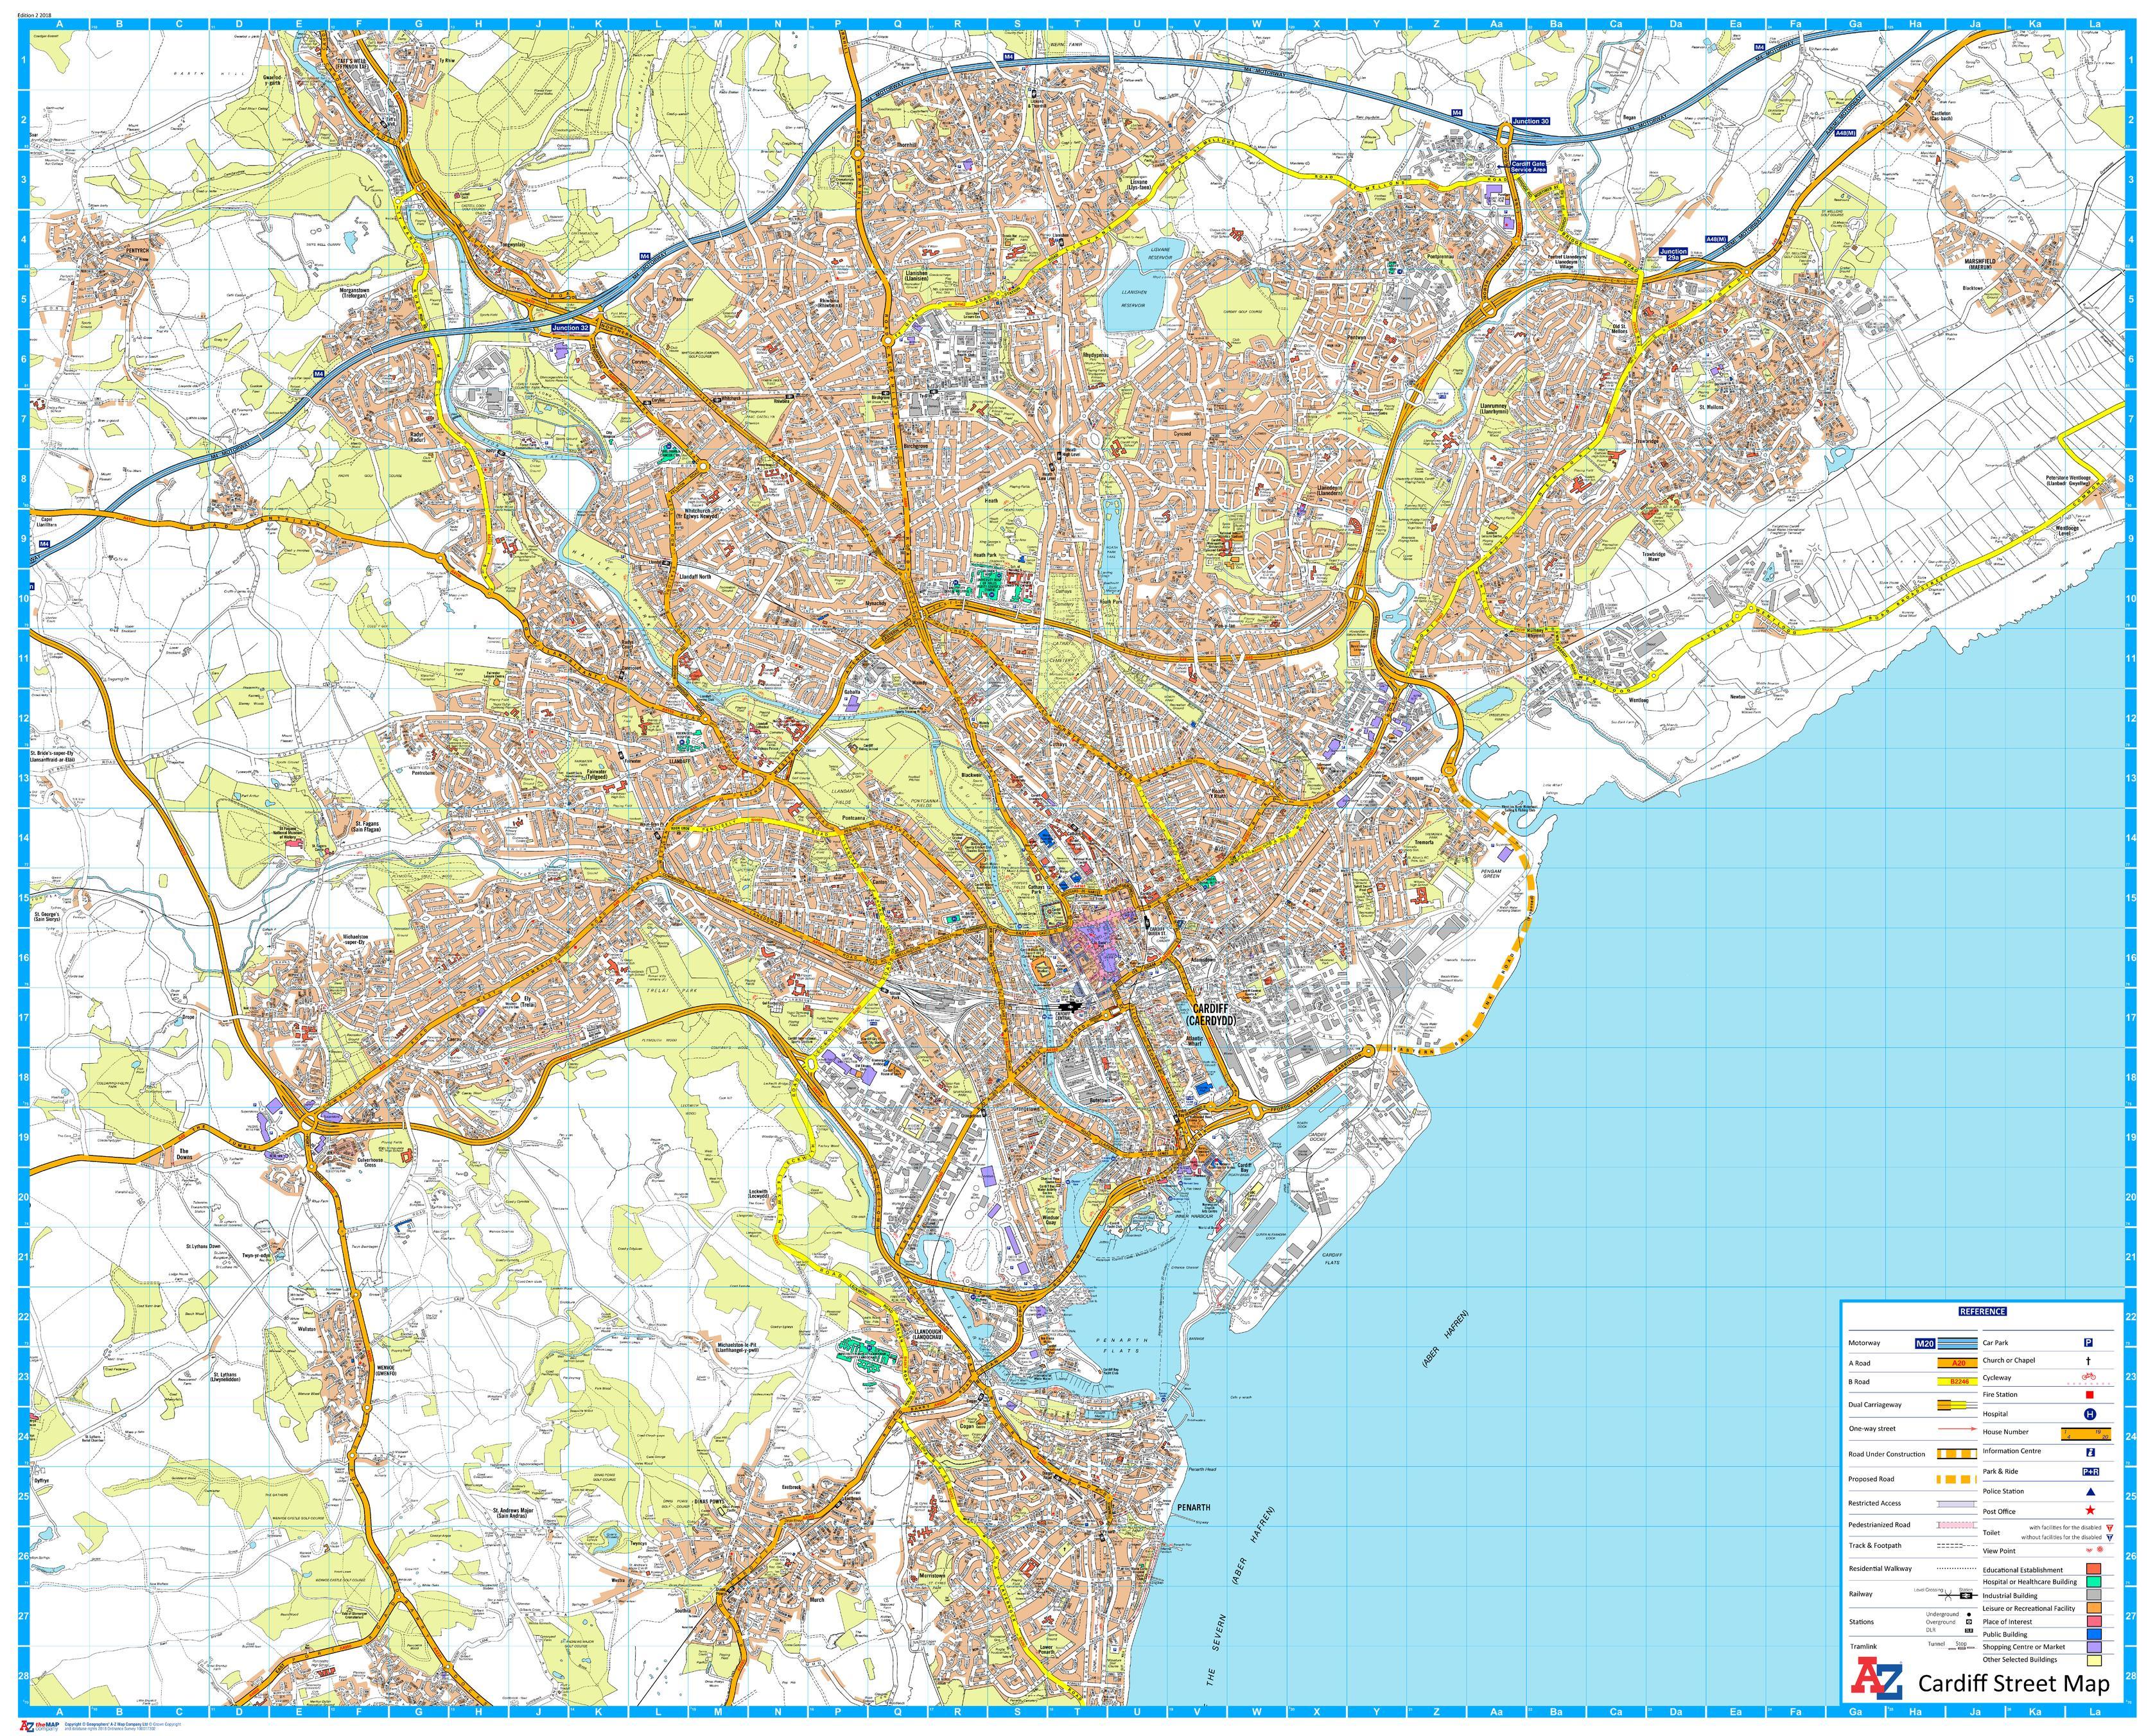 A-Z Cardiff Street Map